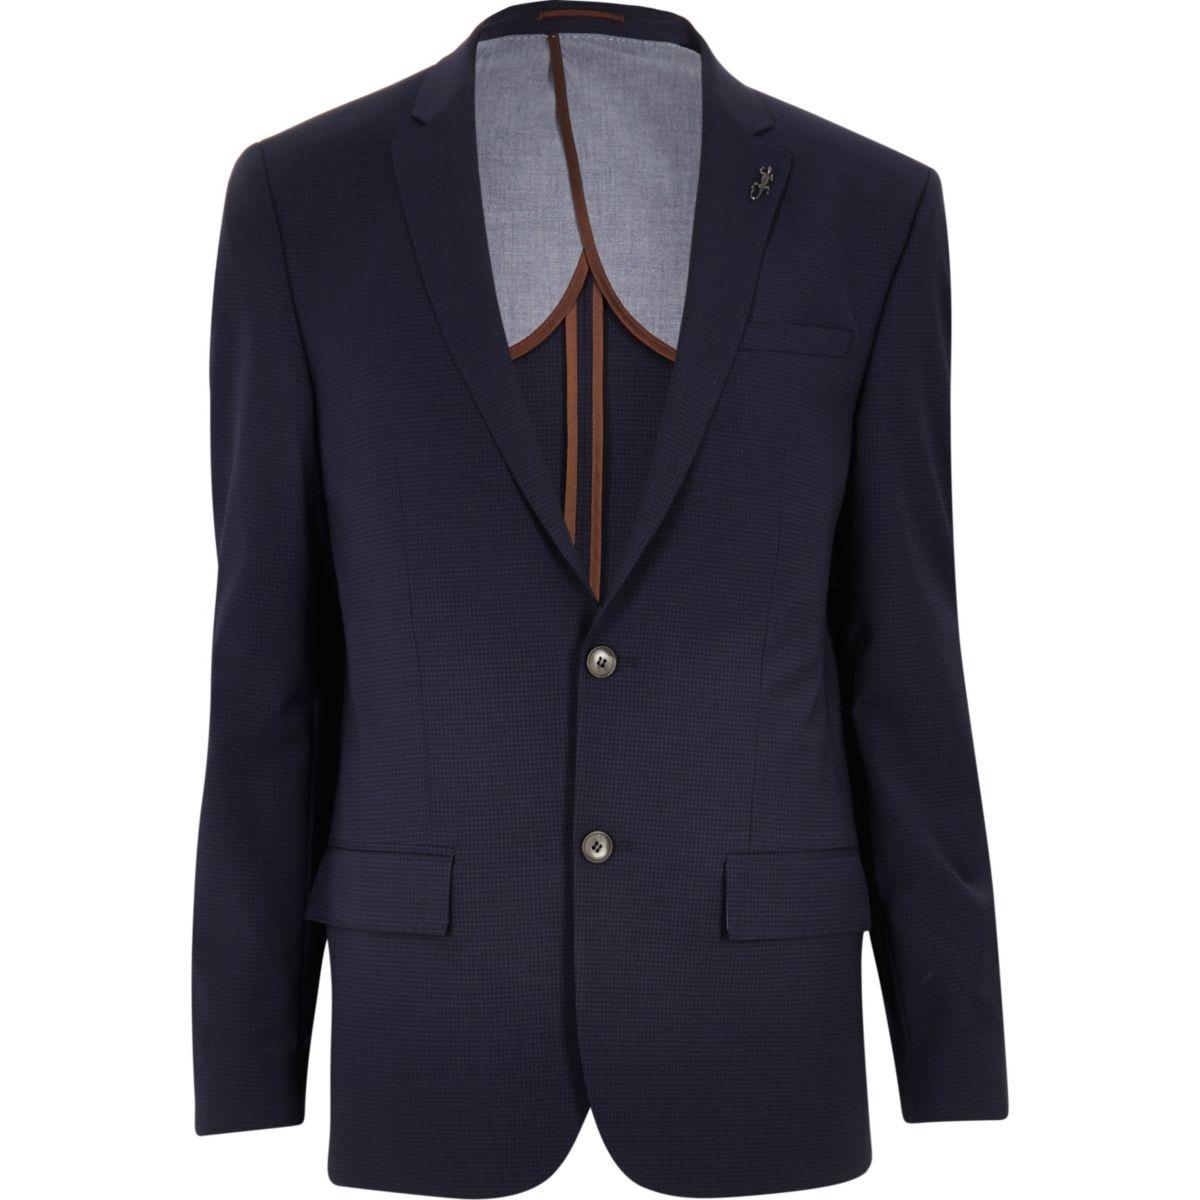 Veste de costume en vichy bleu coupe skinny